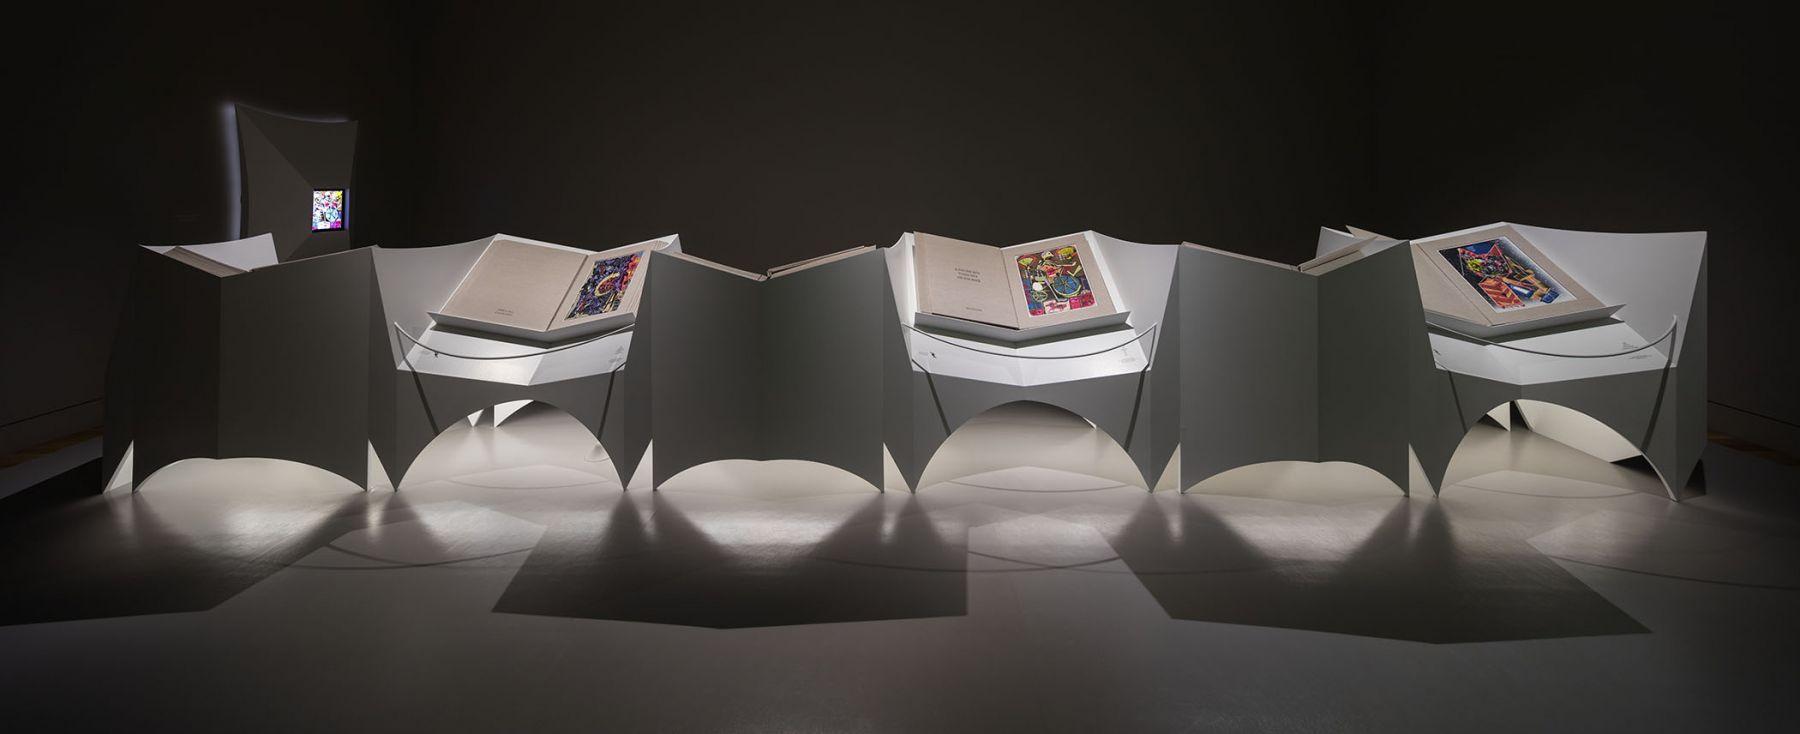 Lari Pittman - Mood Books - Huntington